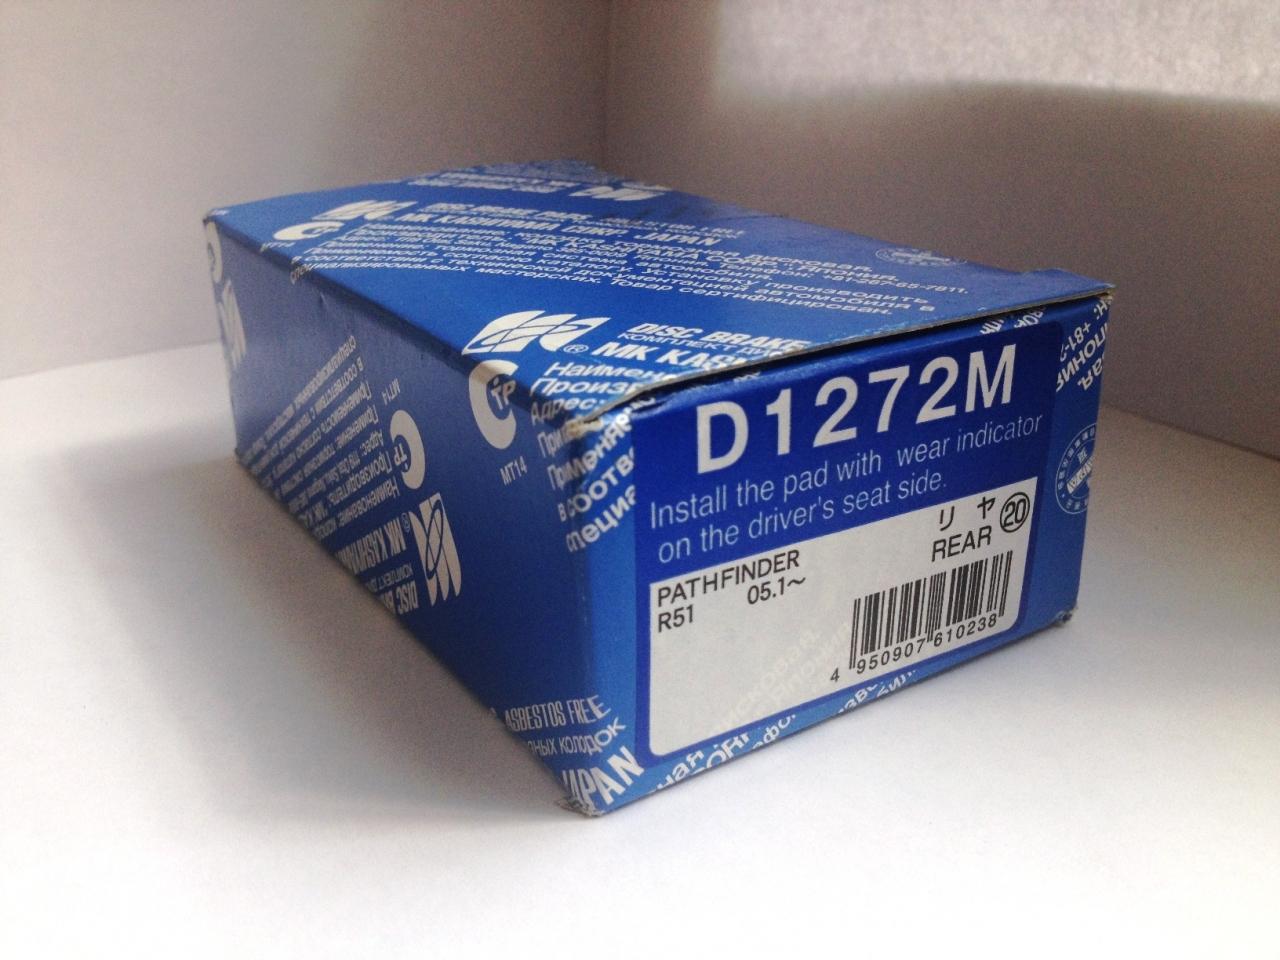 Kashiyama Колодки тормозные задние. D1272MD1272M